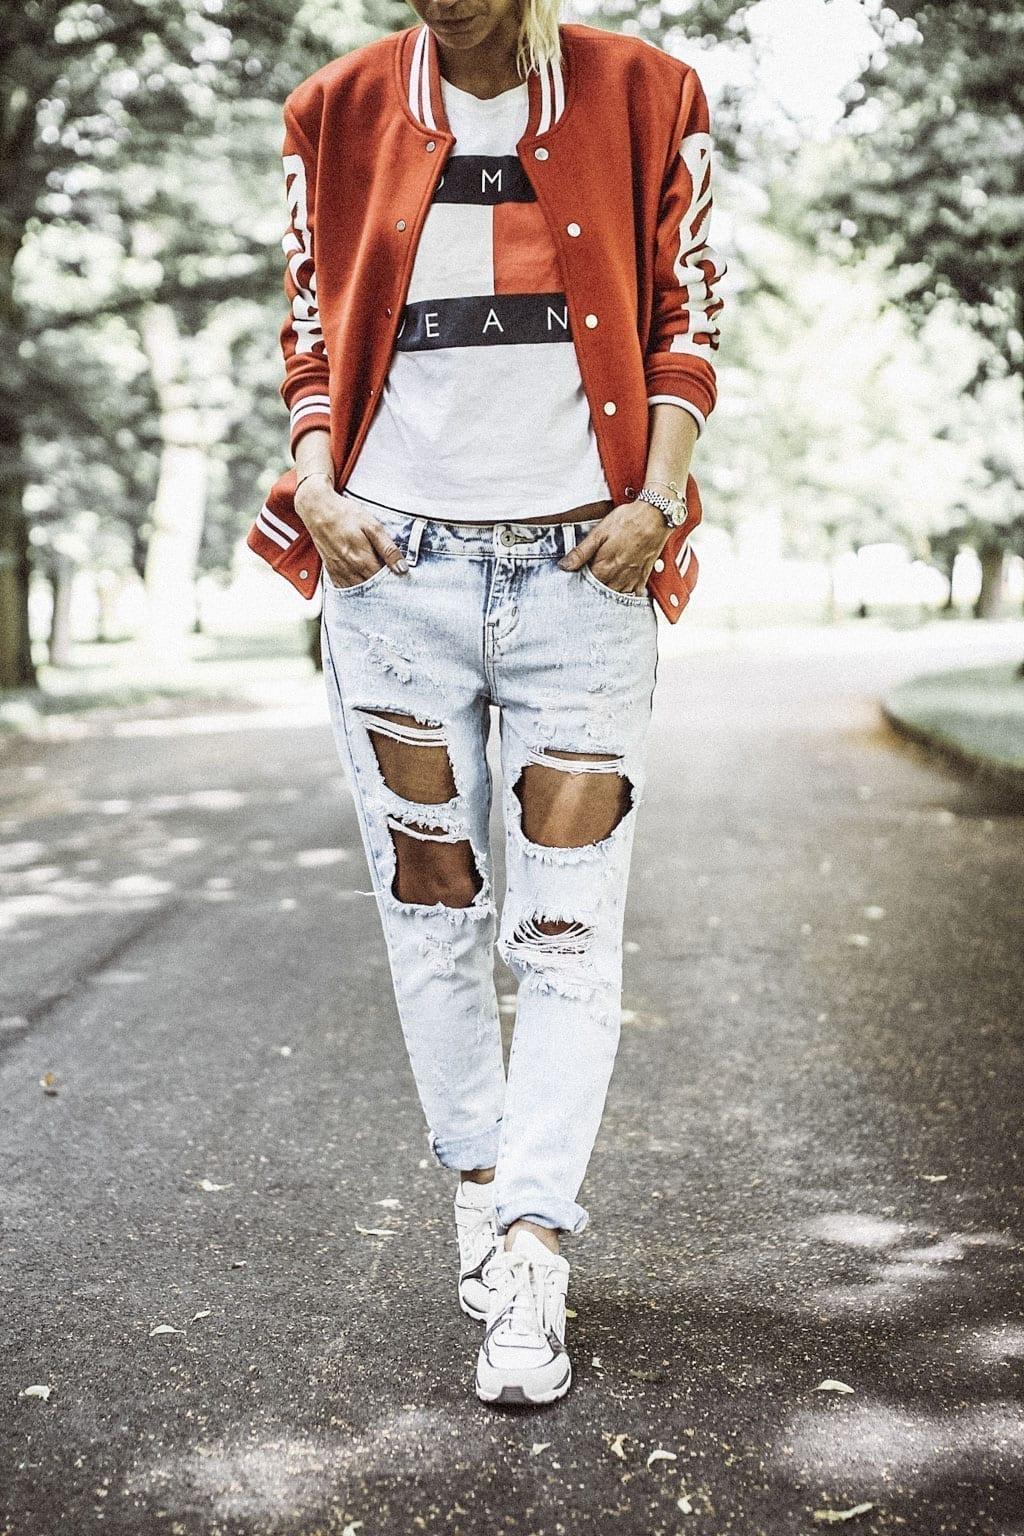 Constantly-K-karin-kaswurm-white-red-rieger-jacket-salzburg-fashion-street-style-9053